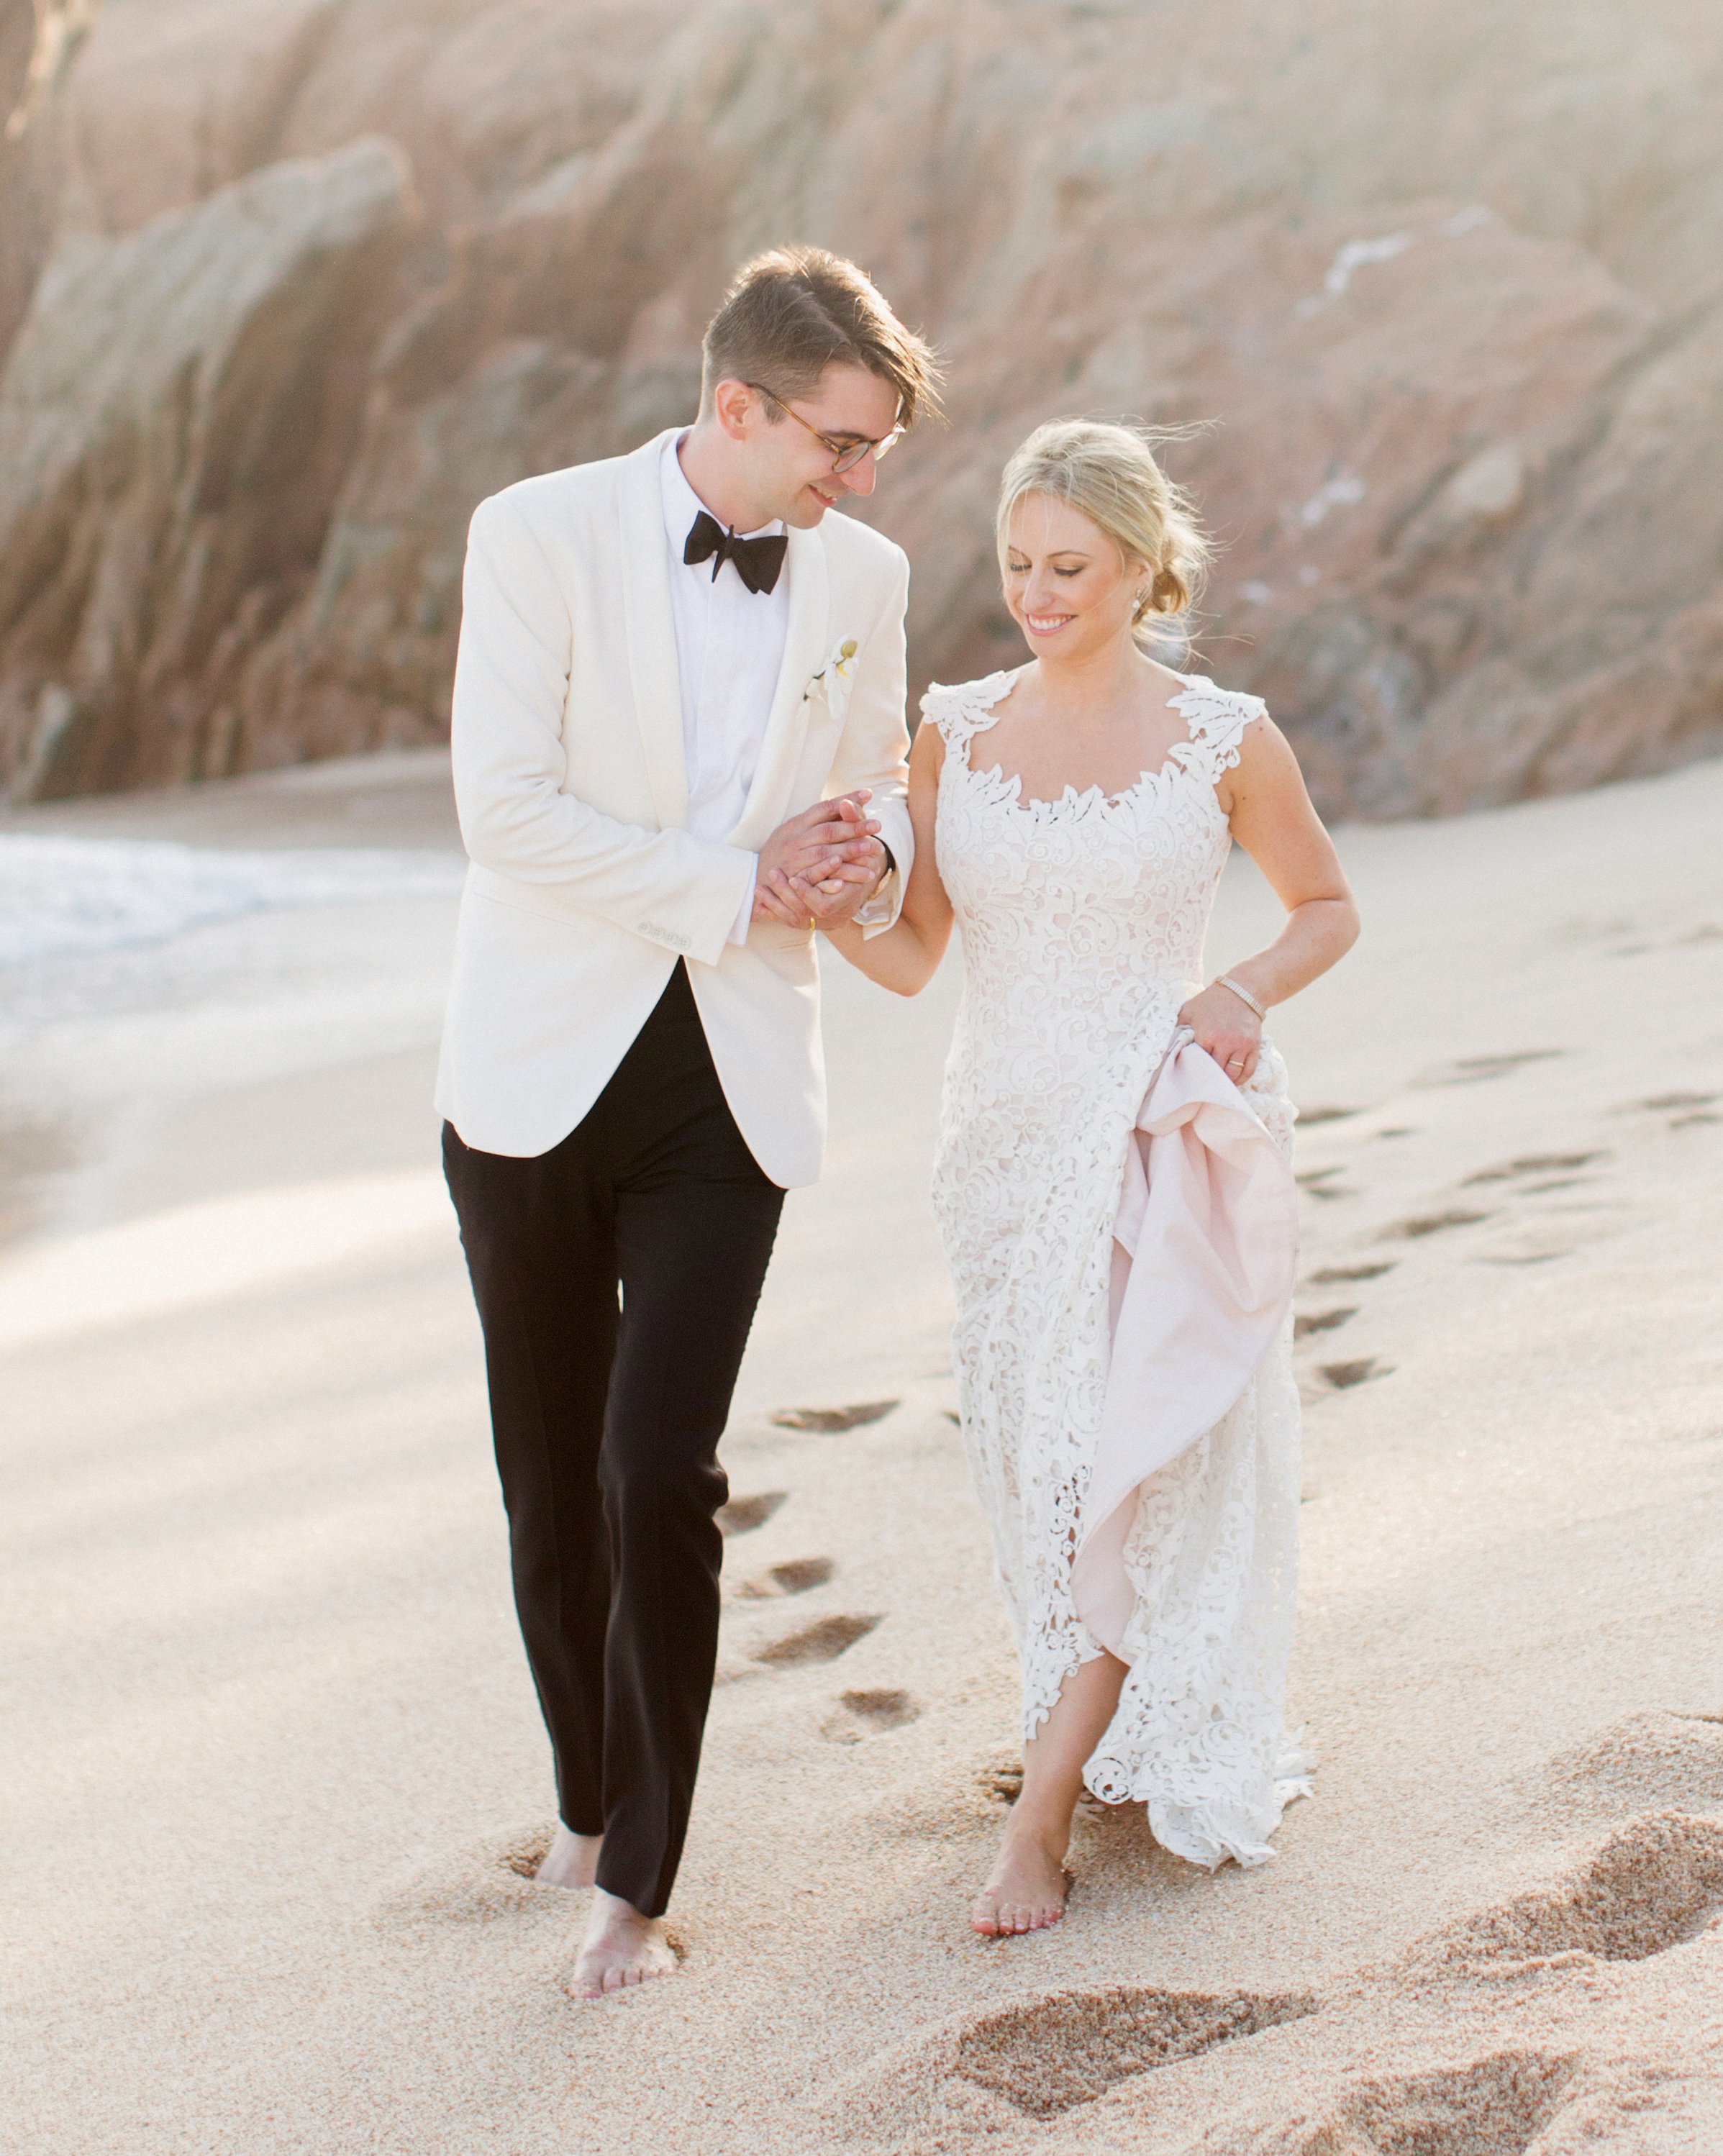 veronica-mathieu-wedding-couple-0901-s111501-1014.jpg